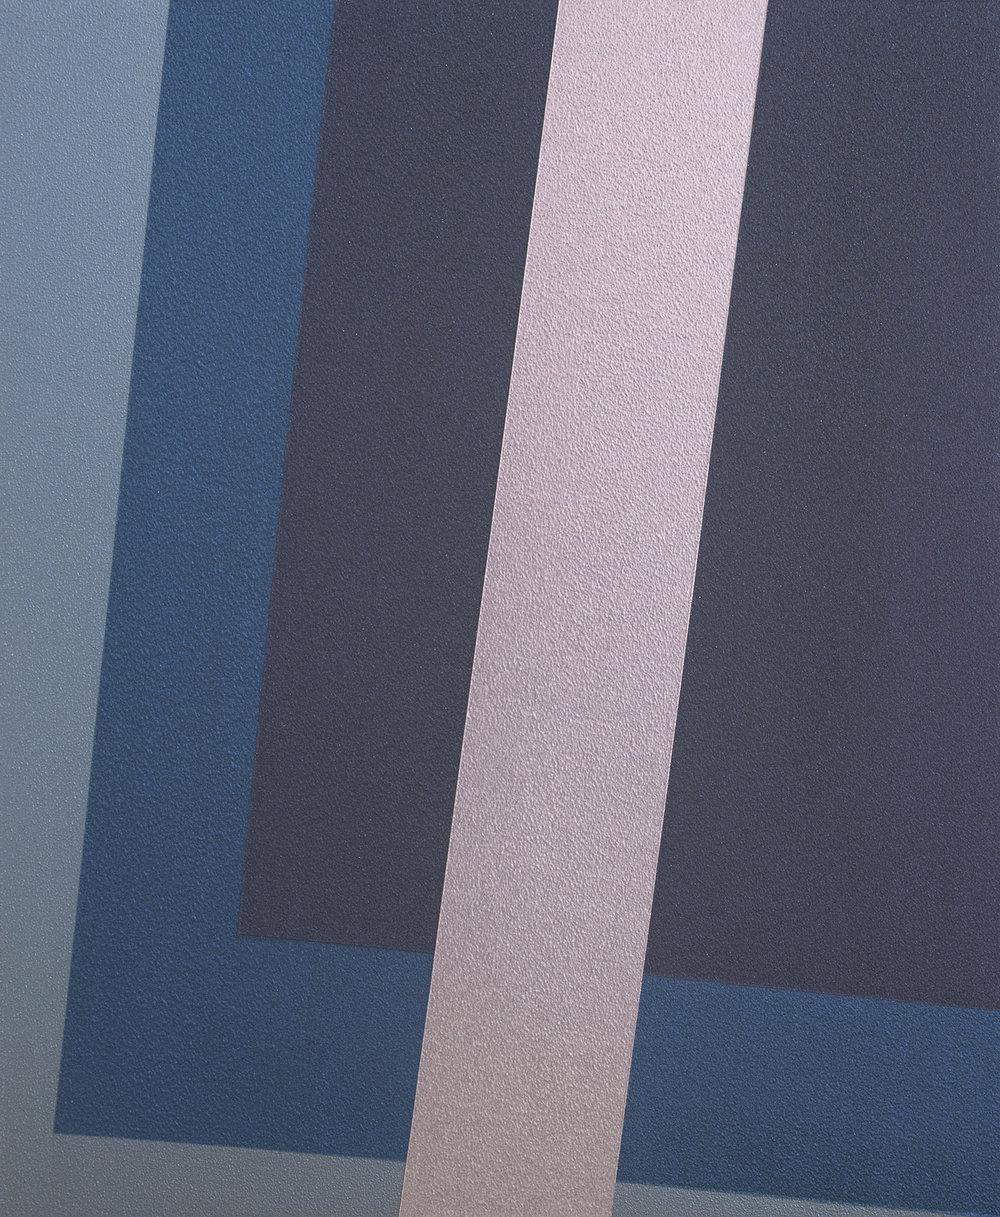 SAMARA ADAMSON-PINCZEWSKI Violet Corner 2 2014 acrylic on wood panel 30 × 25 cm